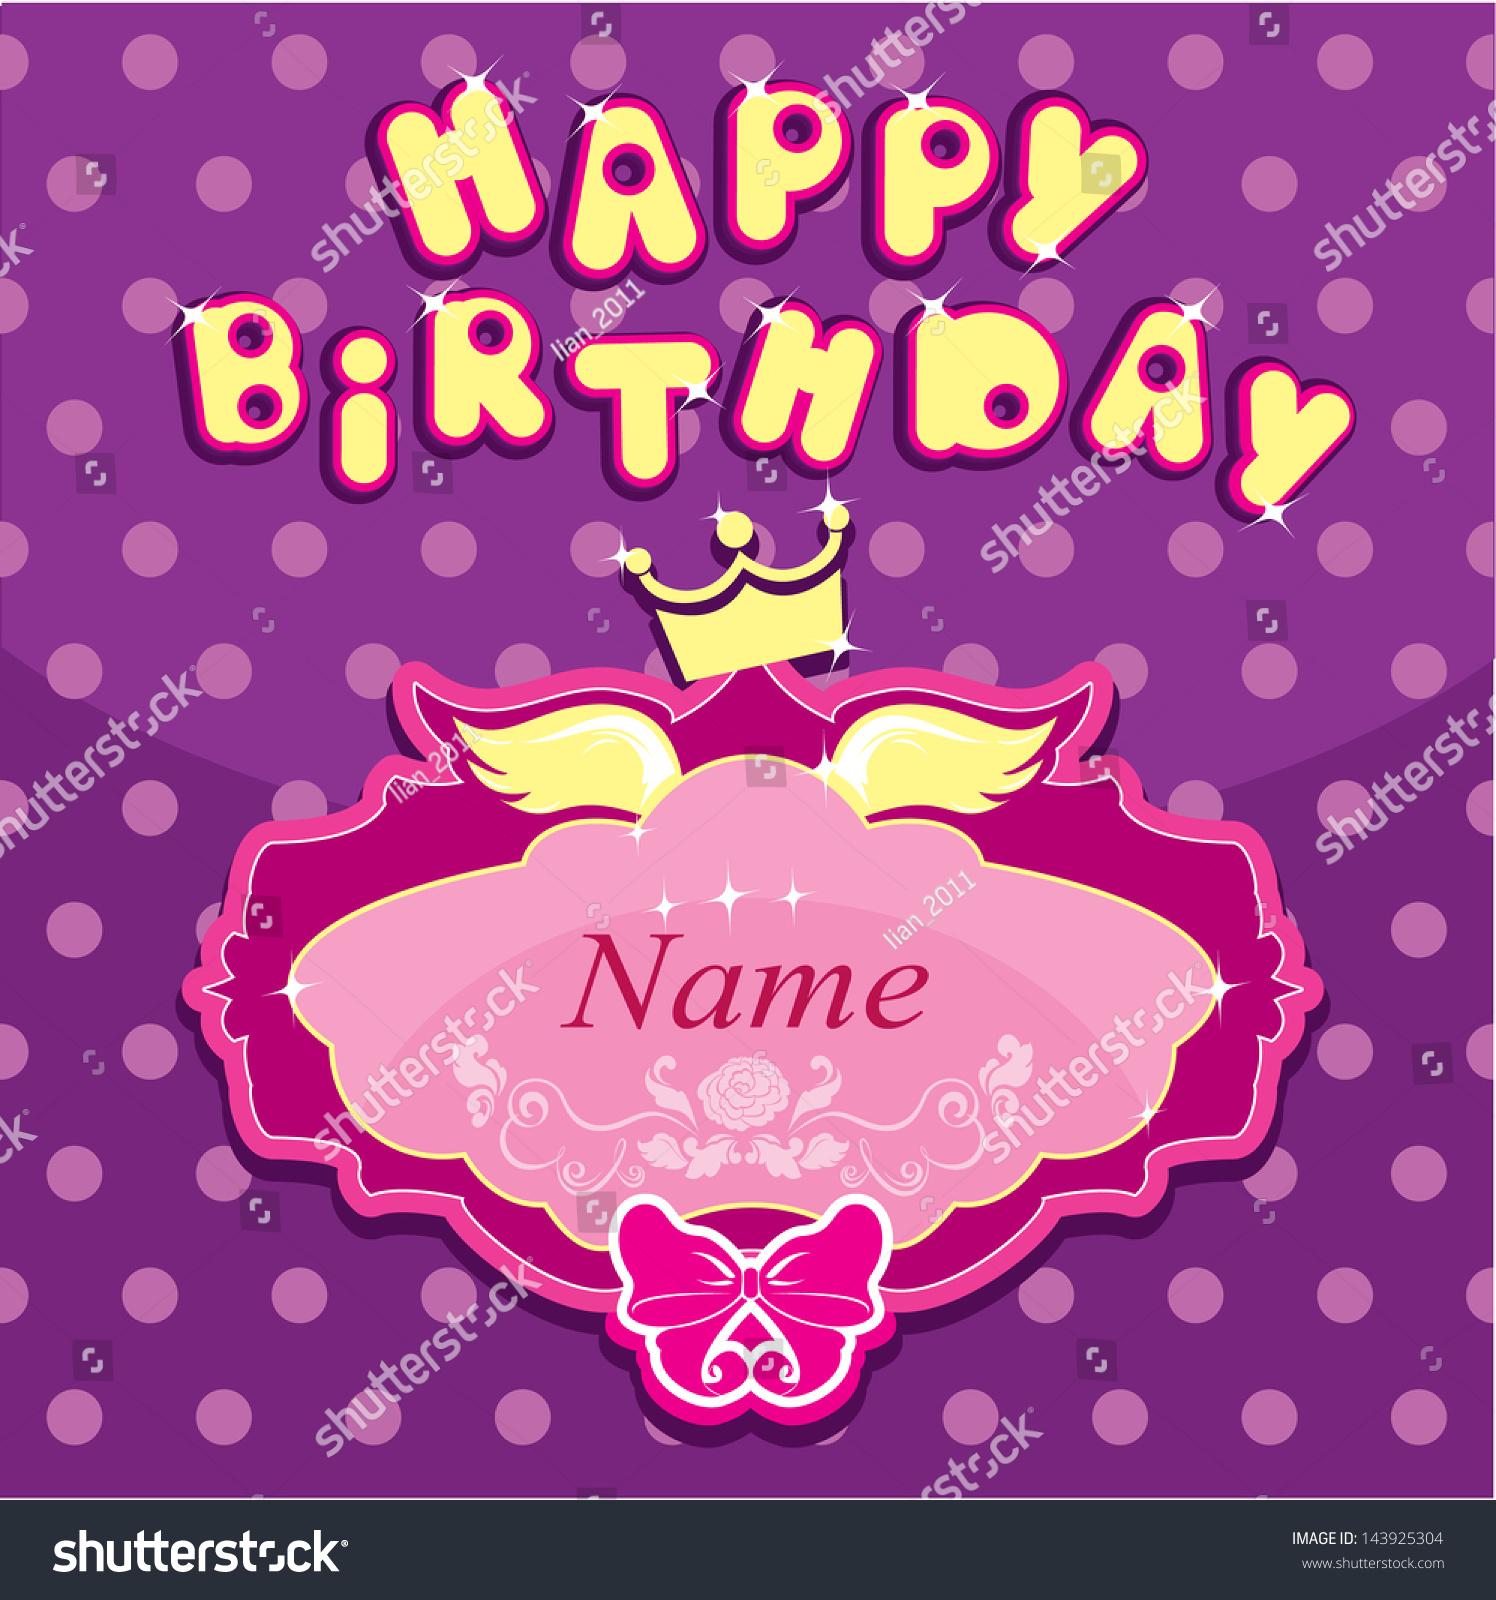 Happy birthday invitation card girl princess stock vector happy birthday invitation card for girl with princess crown and frame stopboris Gallery